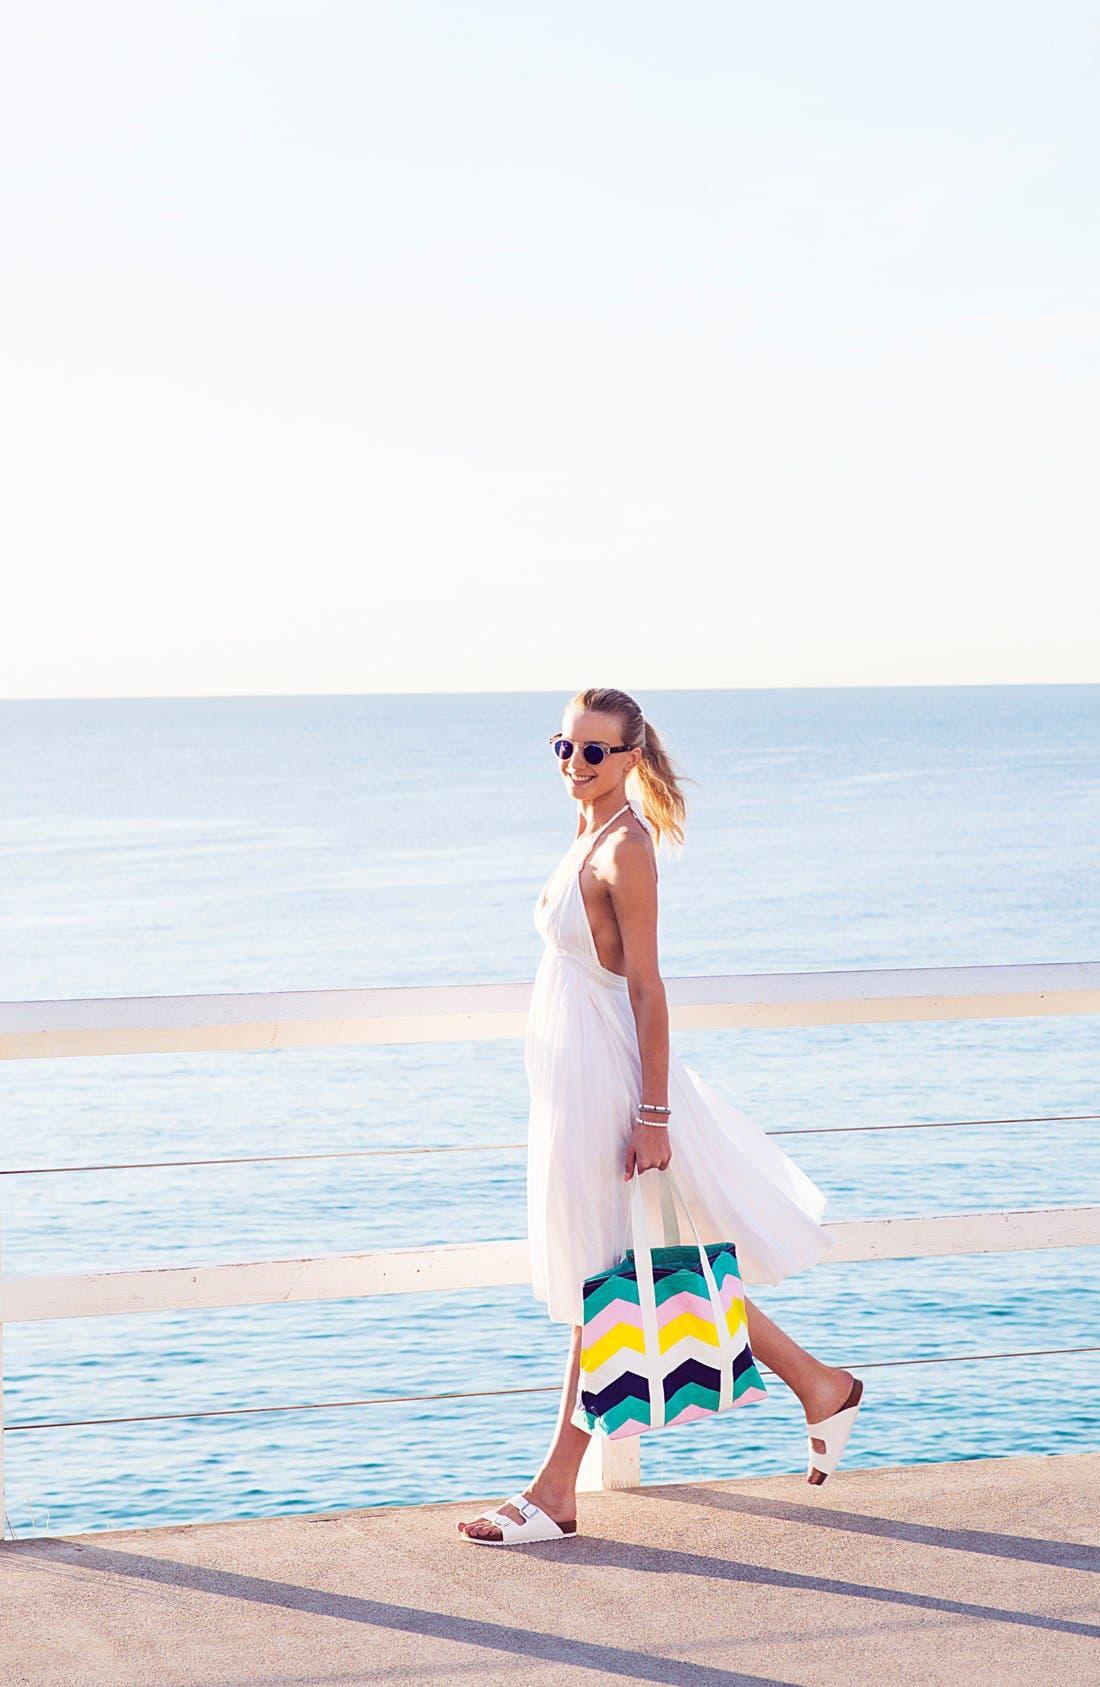 Alternate Image 3  - Sunnylife 'Acapulco' Tote Bag